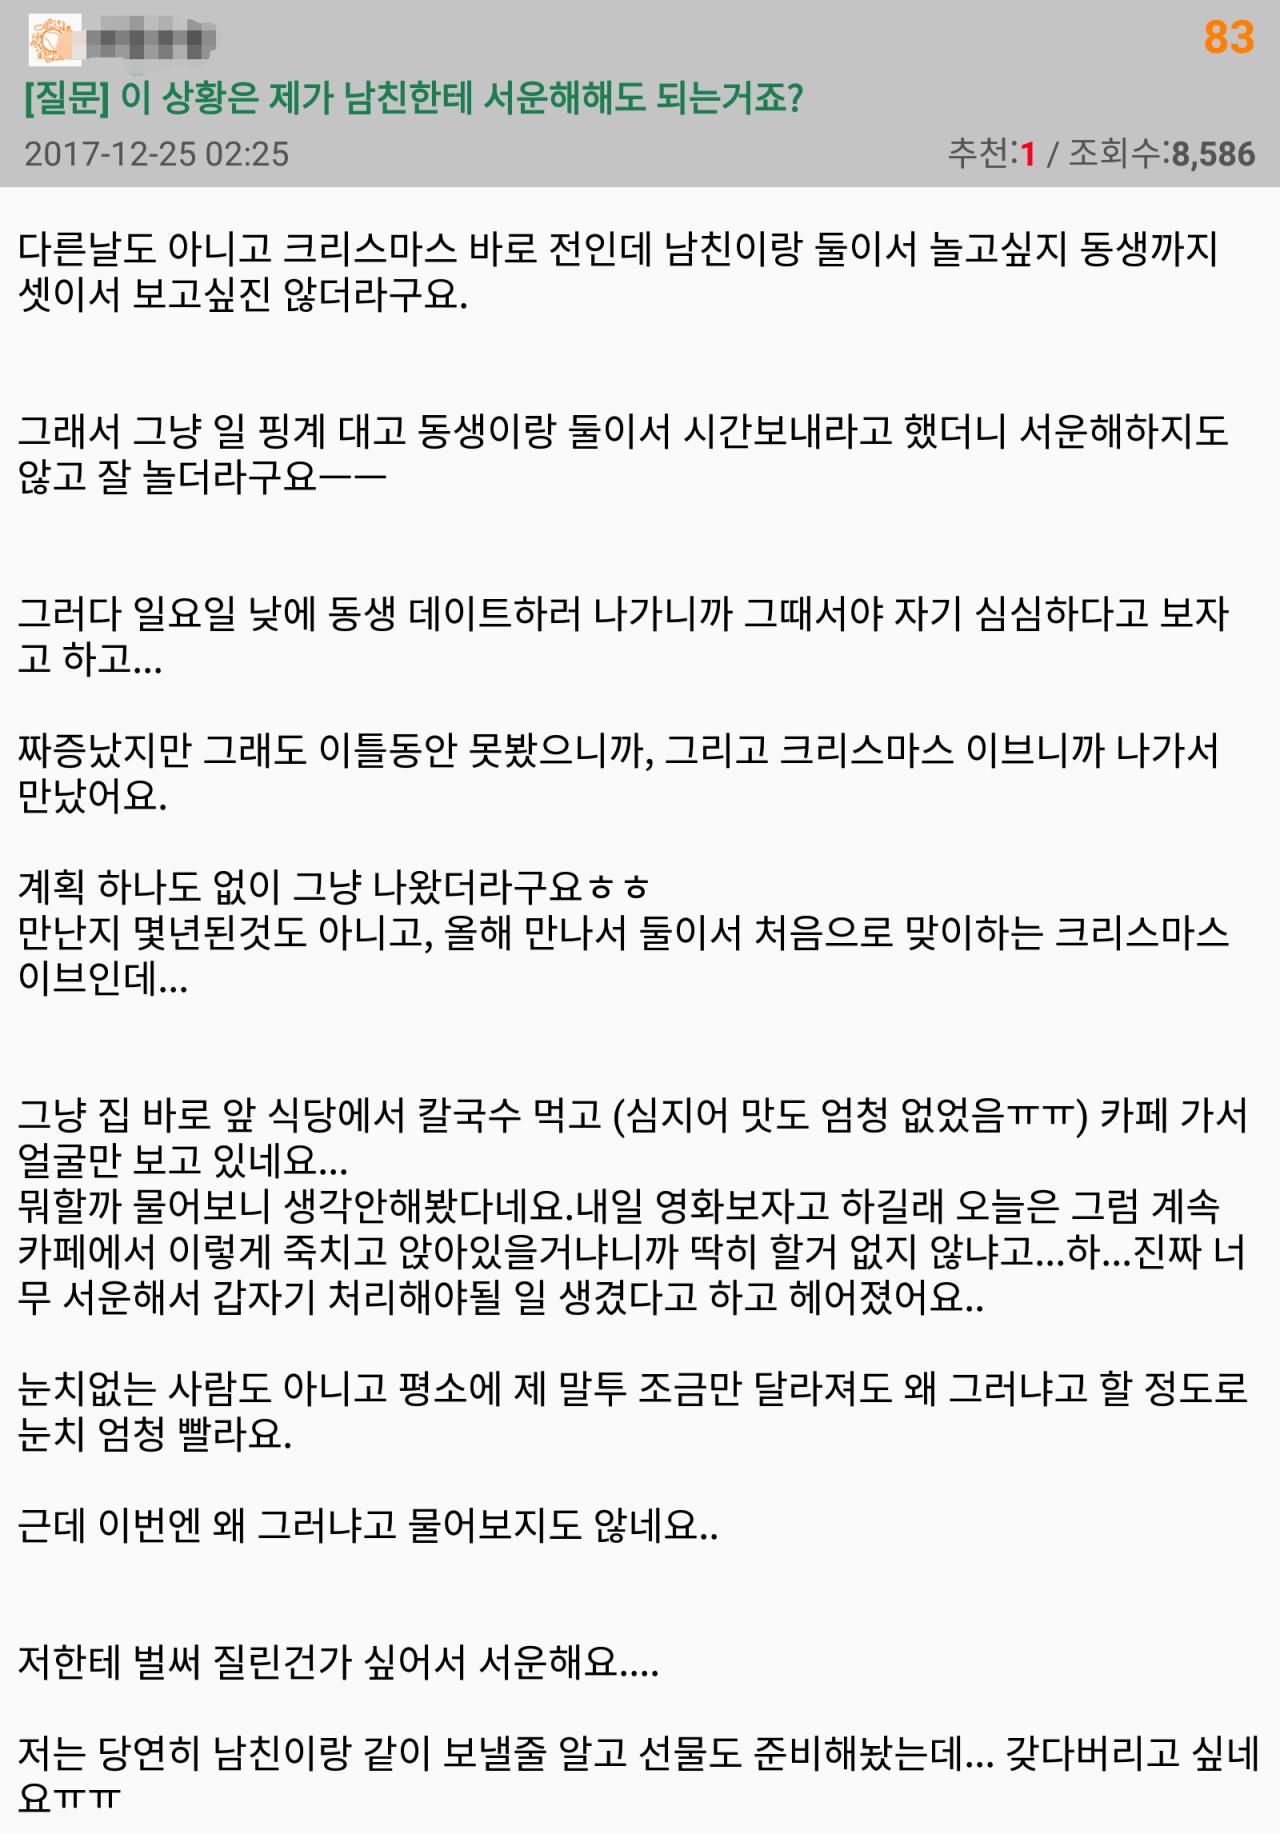 IMG_20180515_134406.png 현재 엠팍에서 댓글 500개 넘긴 예비신부 사연.jpg